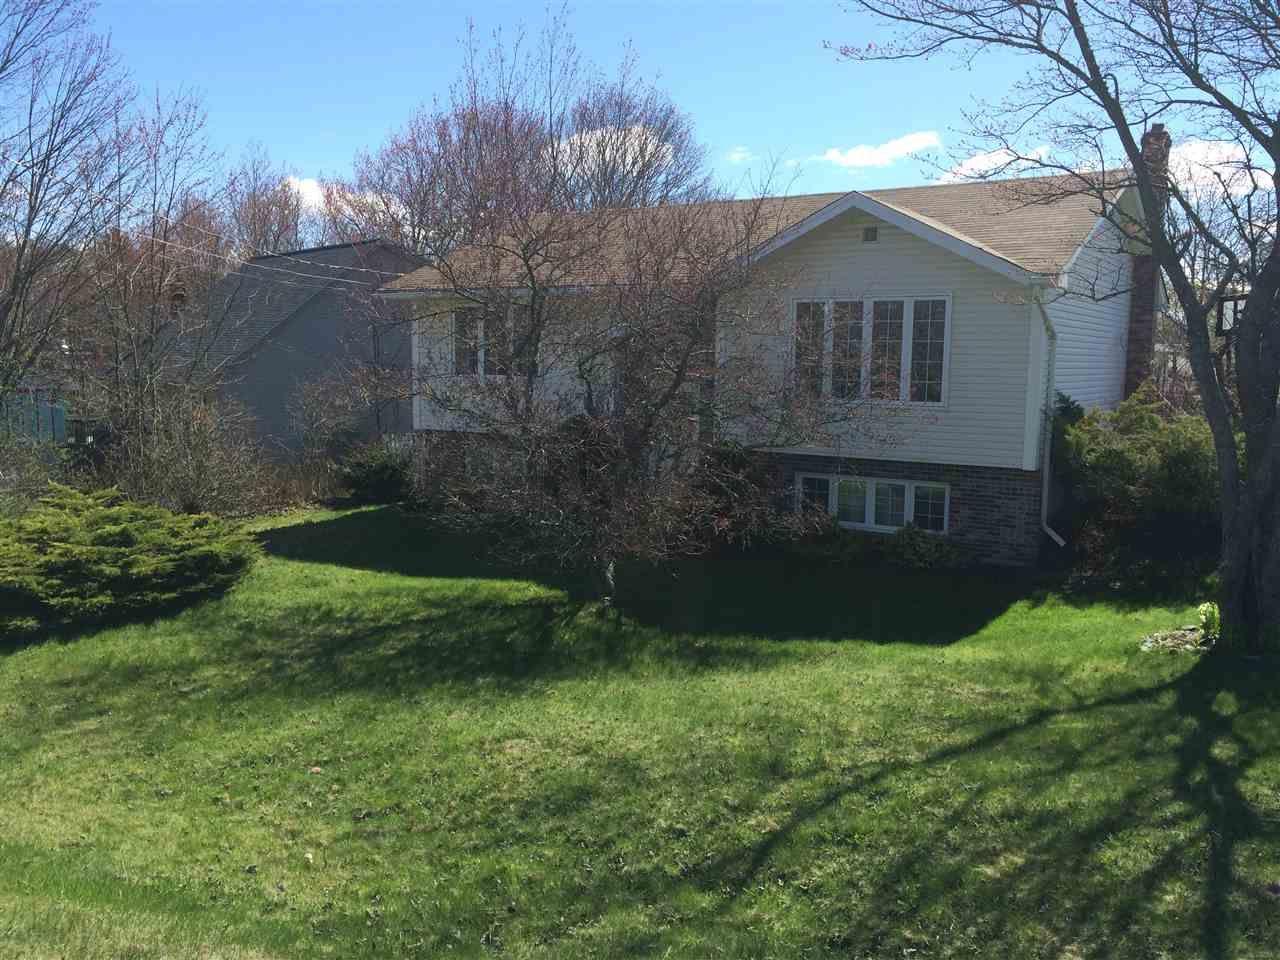 Main Photo: 49 Beaver Bank Road in Lower Sackville: 25-Sackville Residential for sale (Halifax-Dartmouth)  : MLS®# 201705473